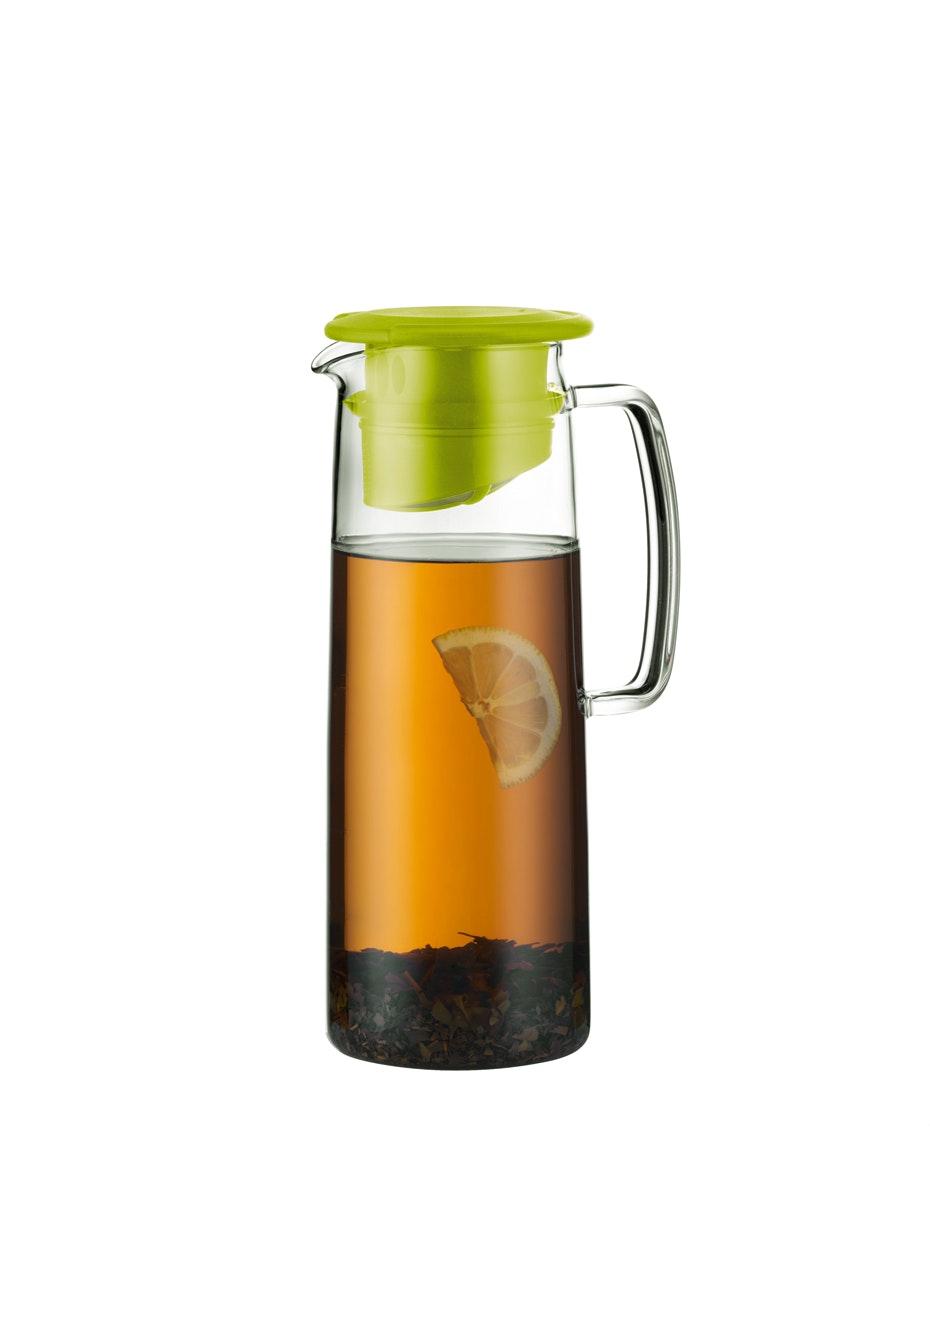 Bodum - Ice Green Tea Jug, 1.2L - Lime